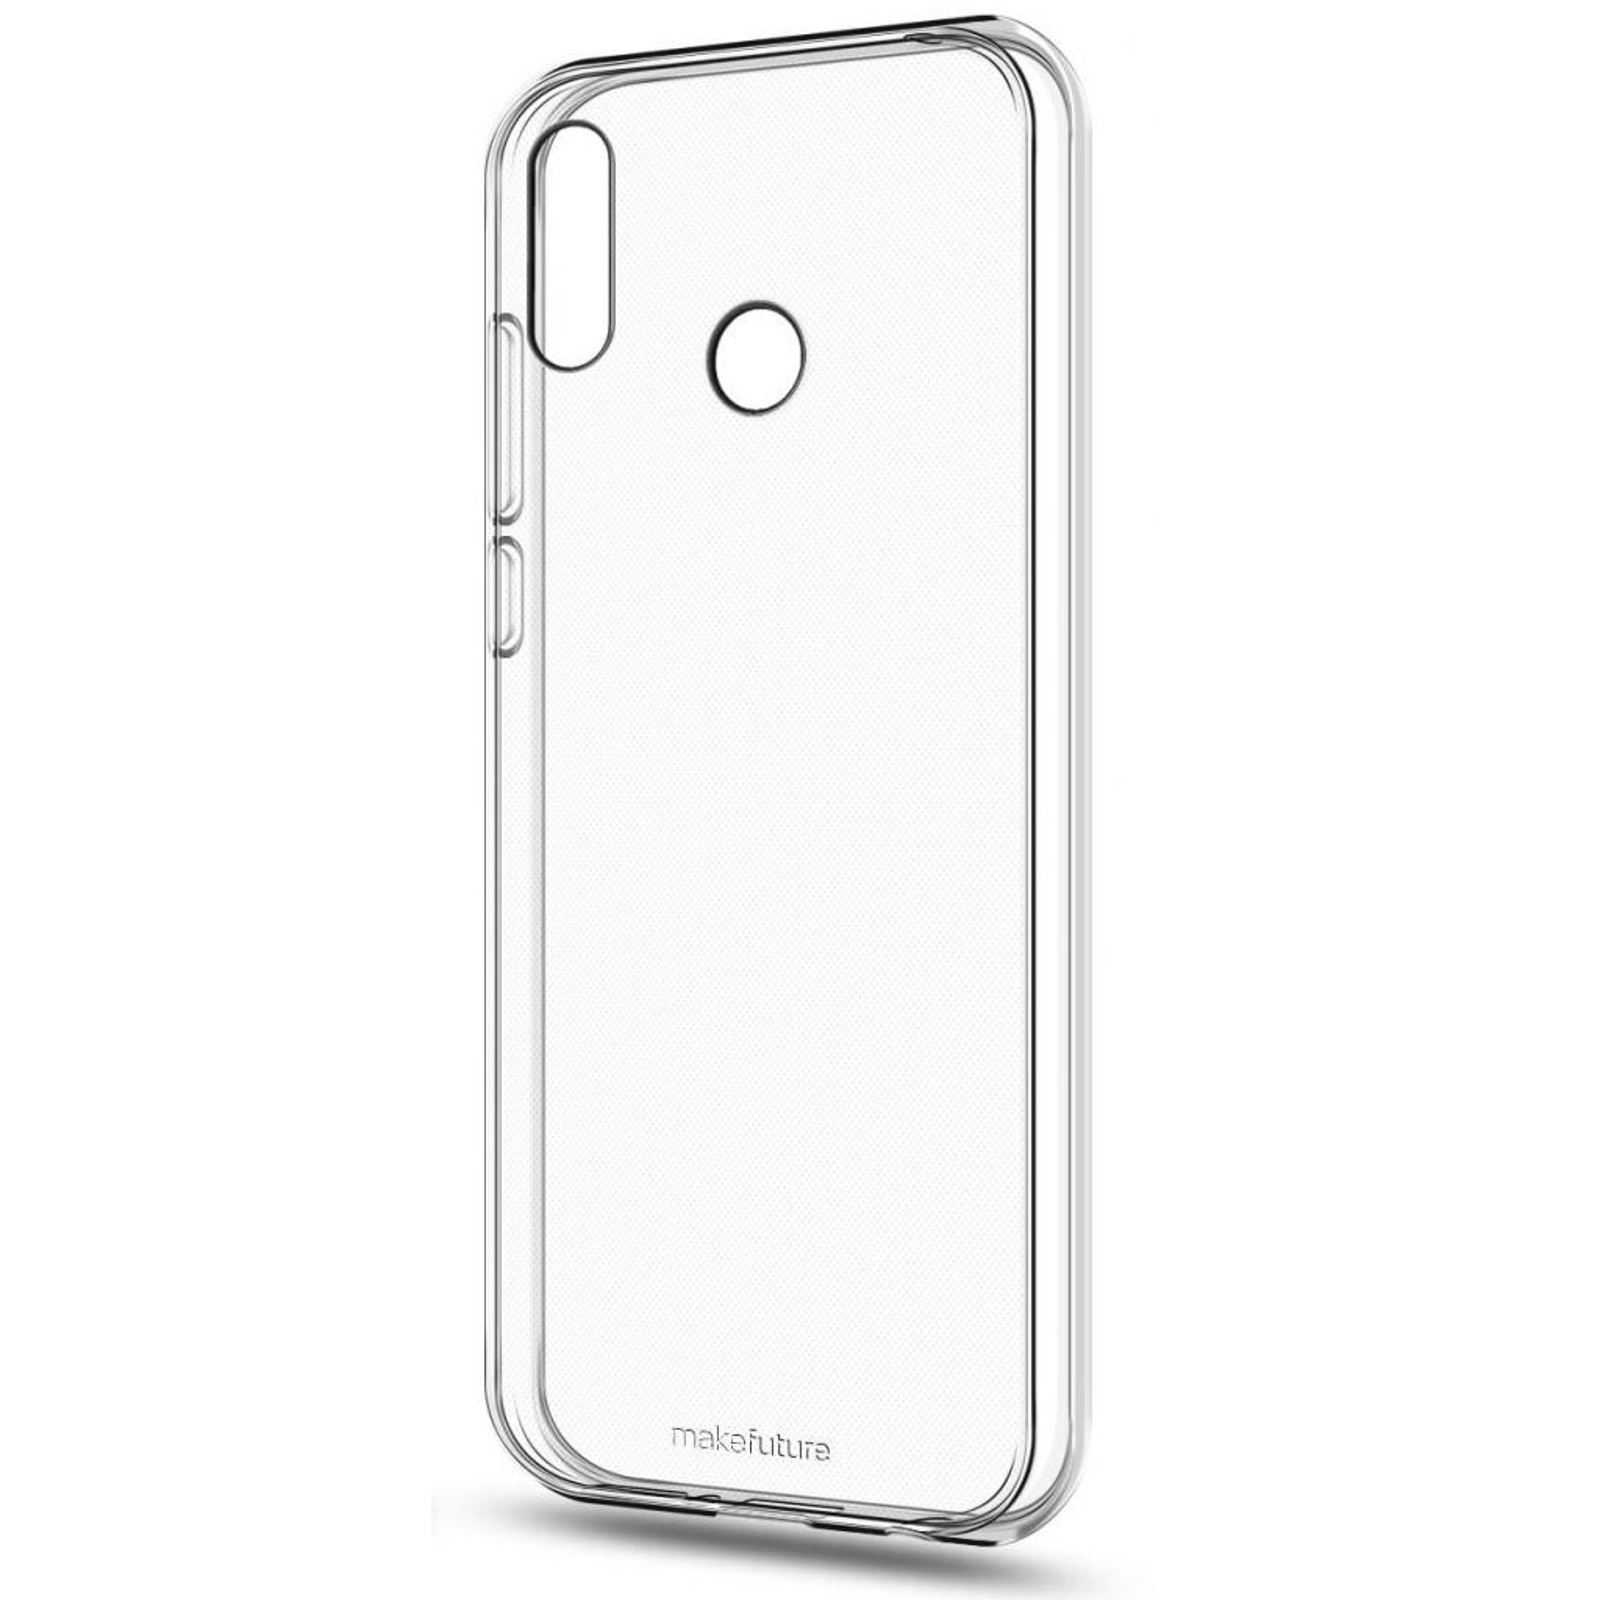 Чехол для моб. телефона MakeFuture Air Case (TPU) Honor Play Clear (MCA-HPCL)